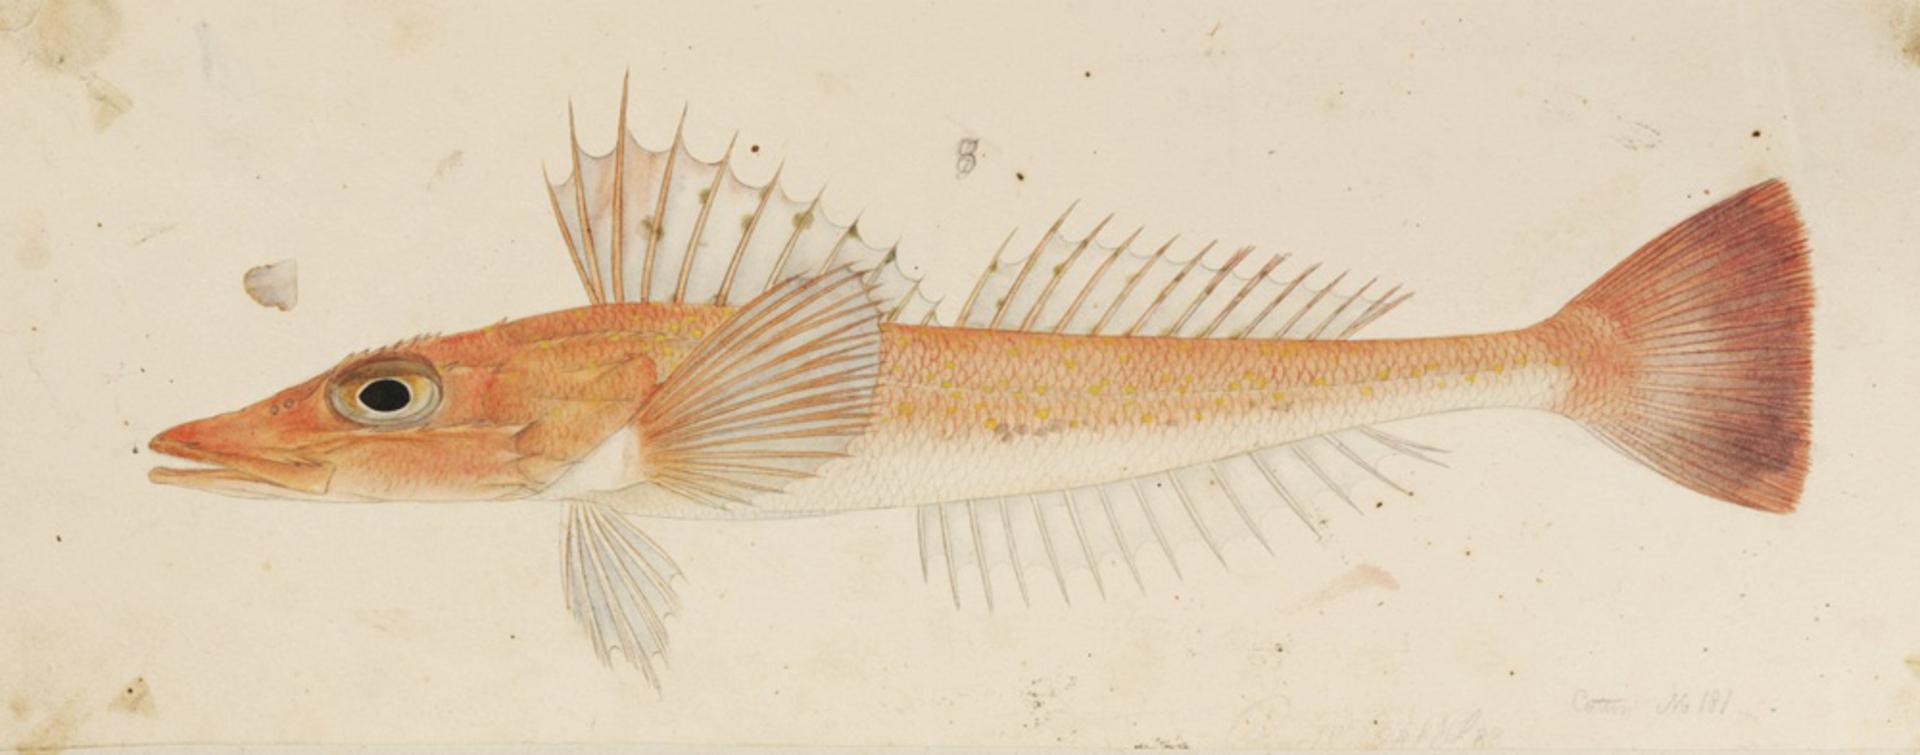 RMNH.ART.244   Bembras japonicus